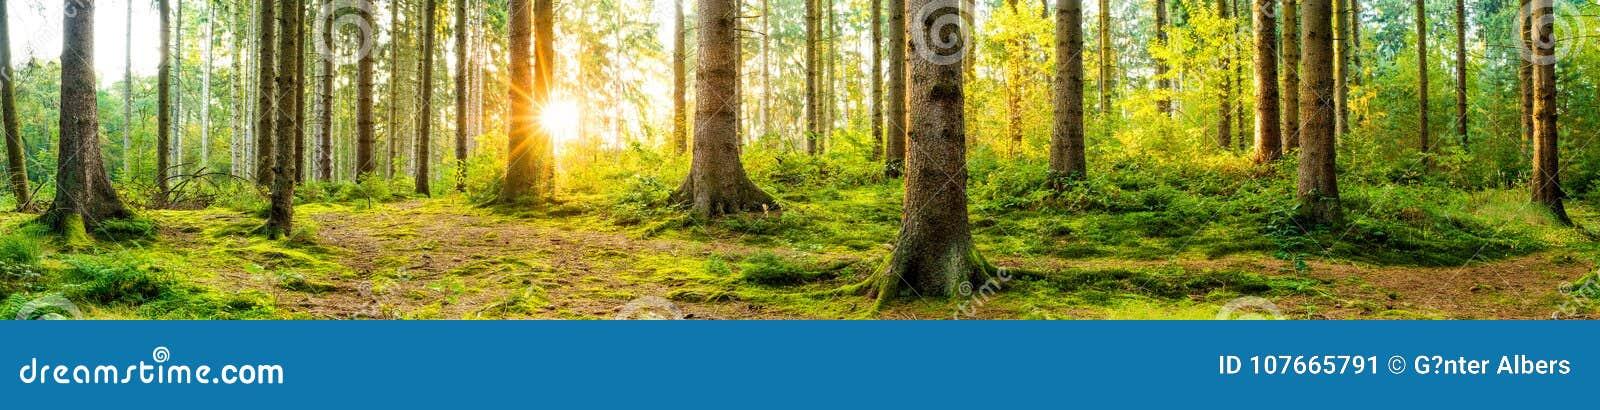 Красивый лес на восходе солнца